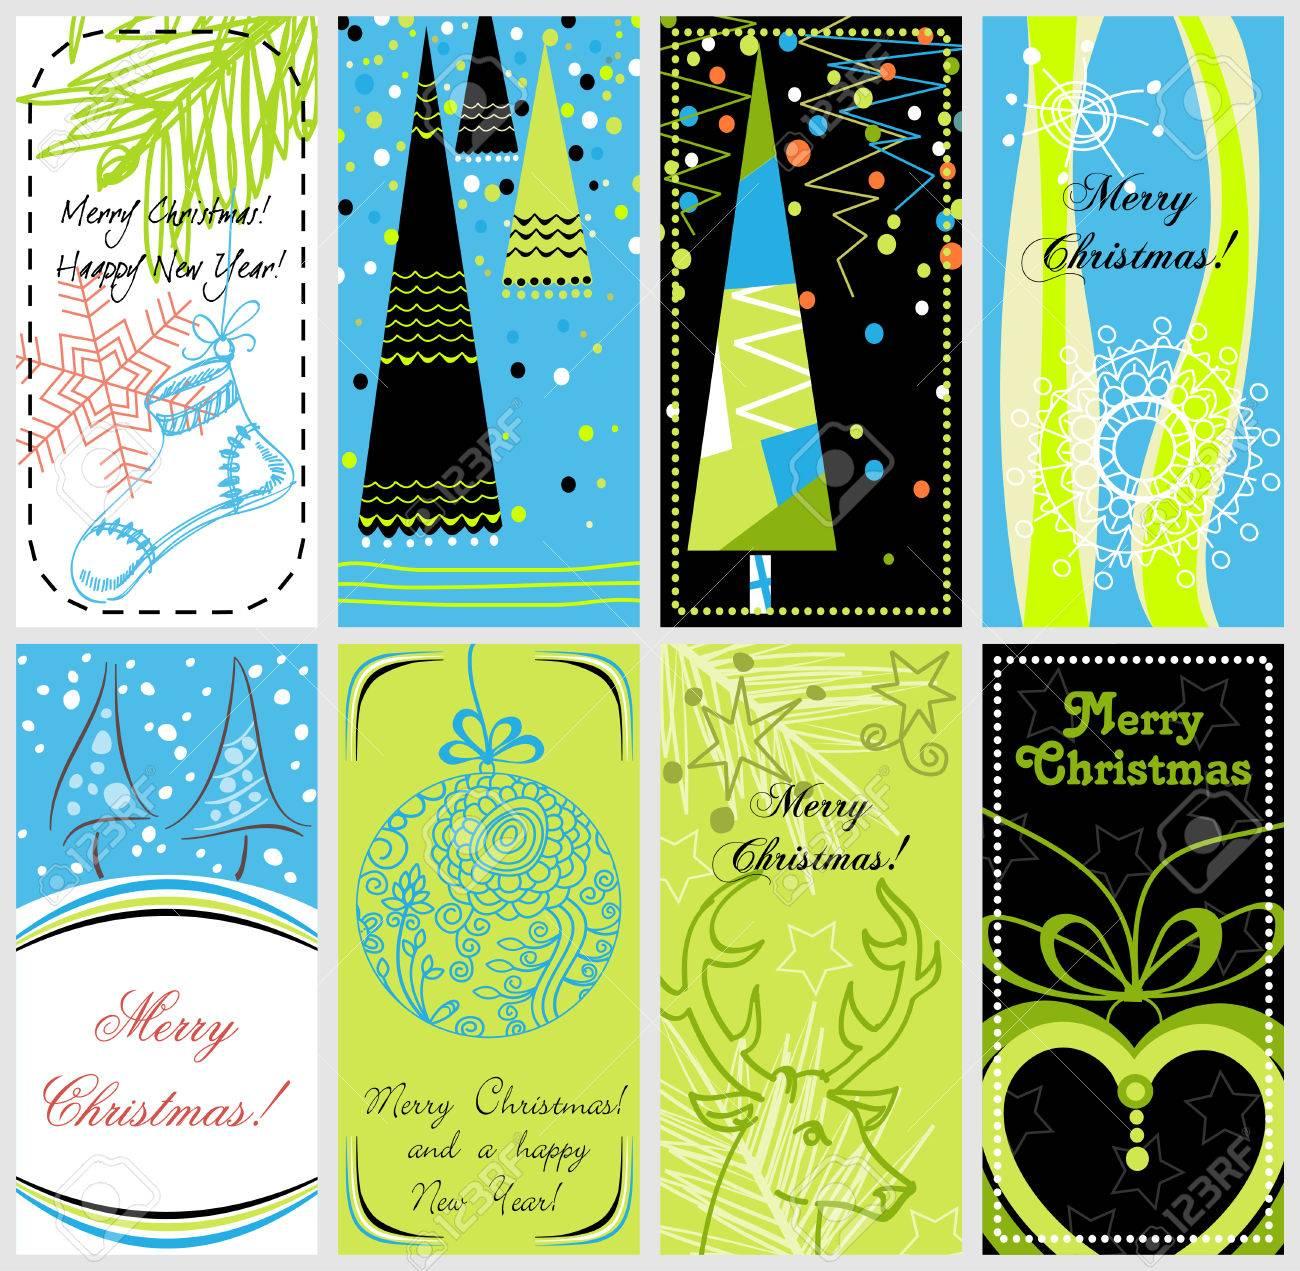 Stylish Christmas banners Stock Vector - 8337489